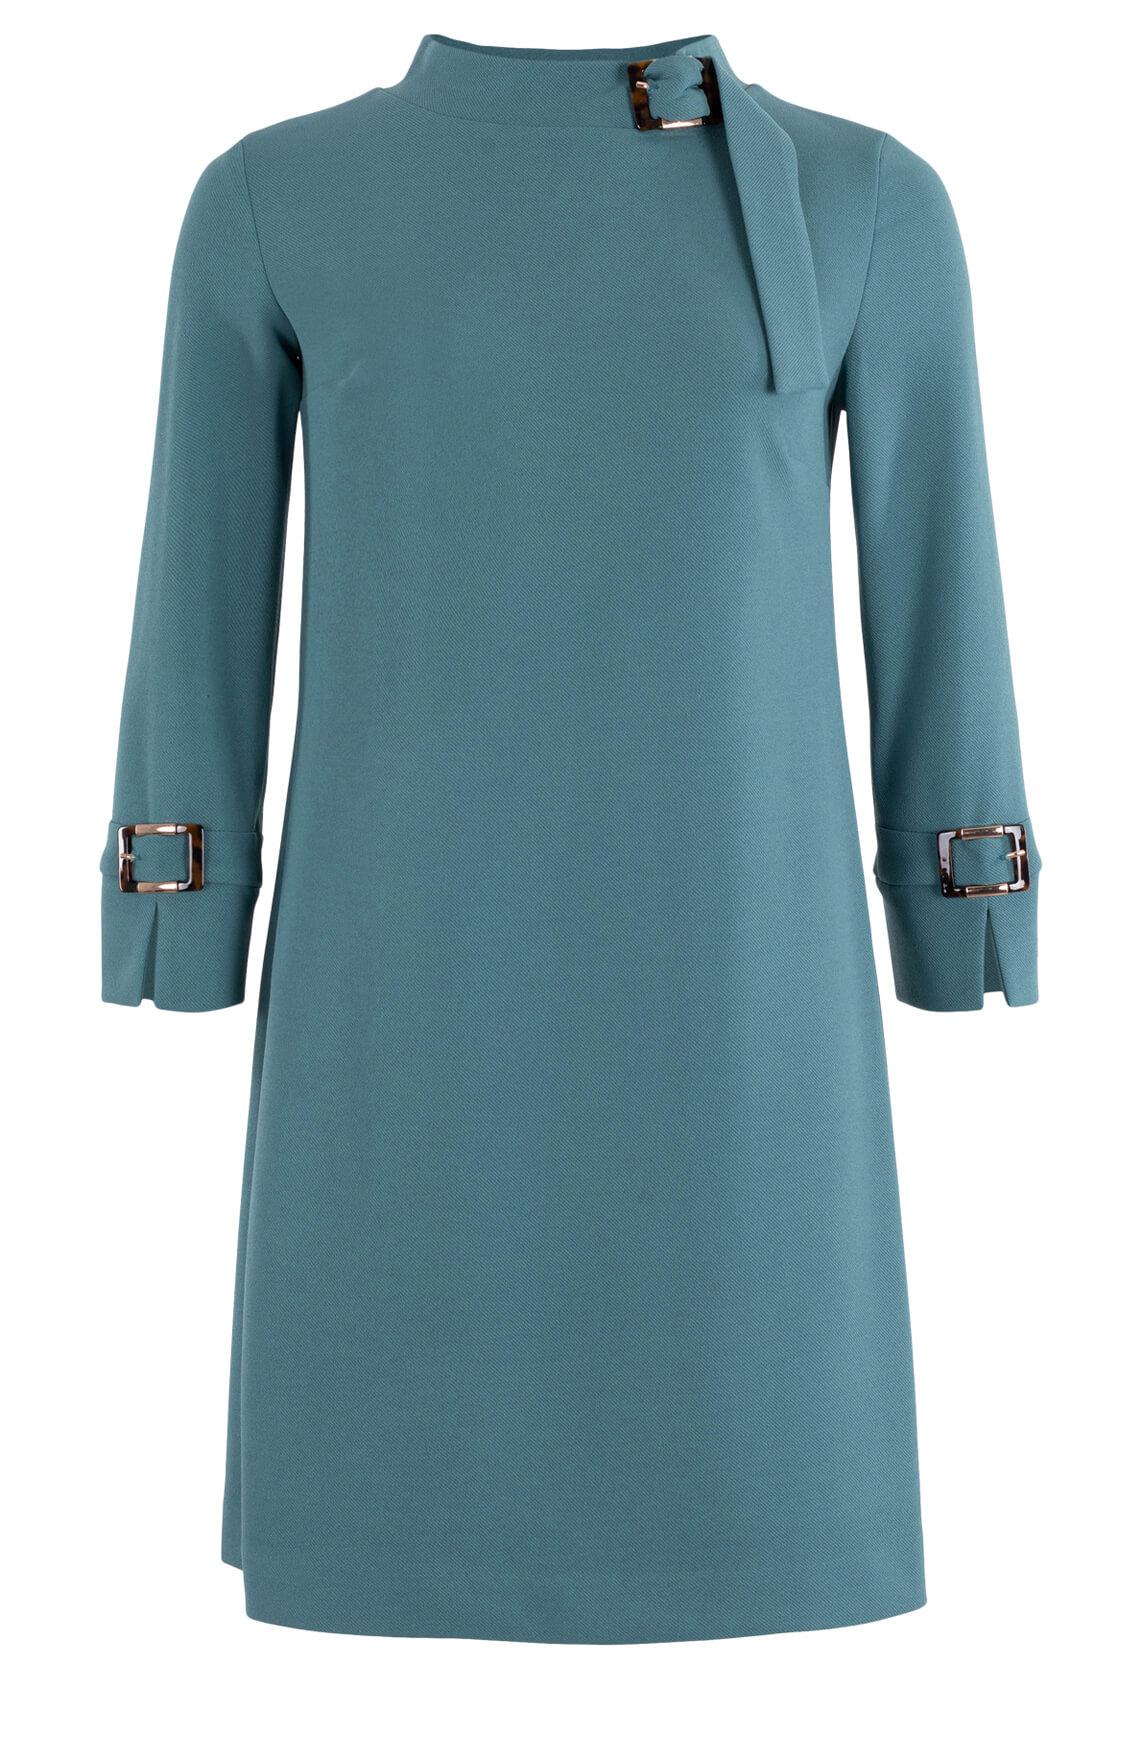 Ana Alcazar Dames Jurk met gespdetail Blauw